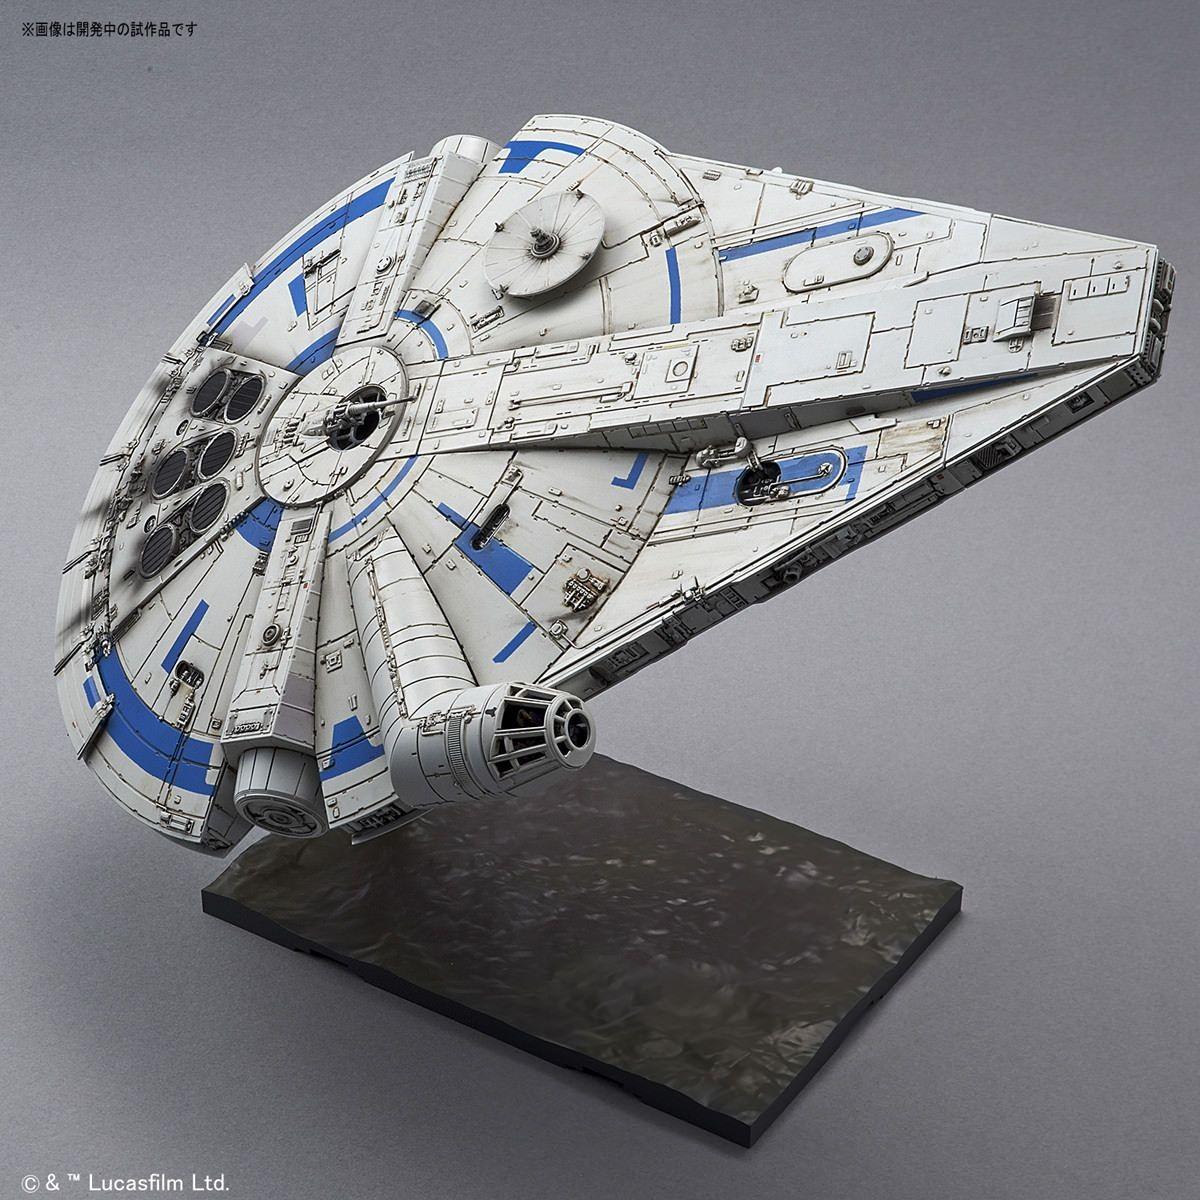 Millenium Falcon Papercraft Imgur the Magic Of the Internet Star Wars Models